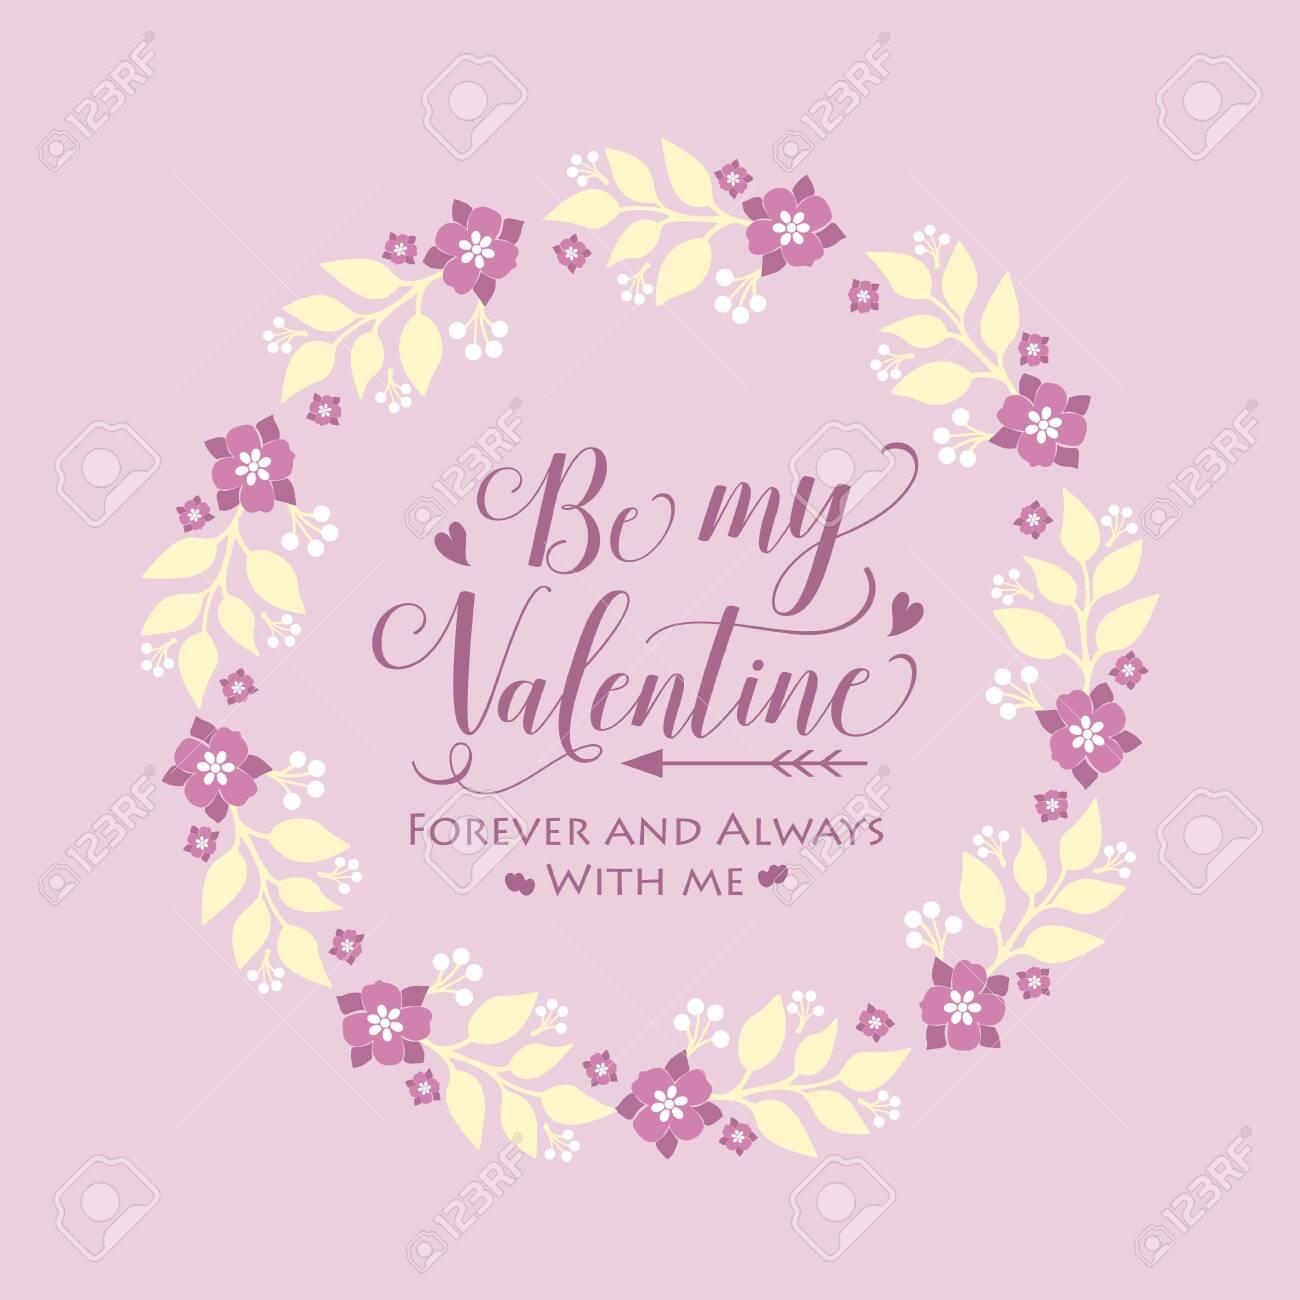 Pattern wallpaper of cards happy valentine, with pink floral frame decoration elegant.Vector illustration - 148989210